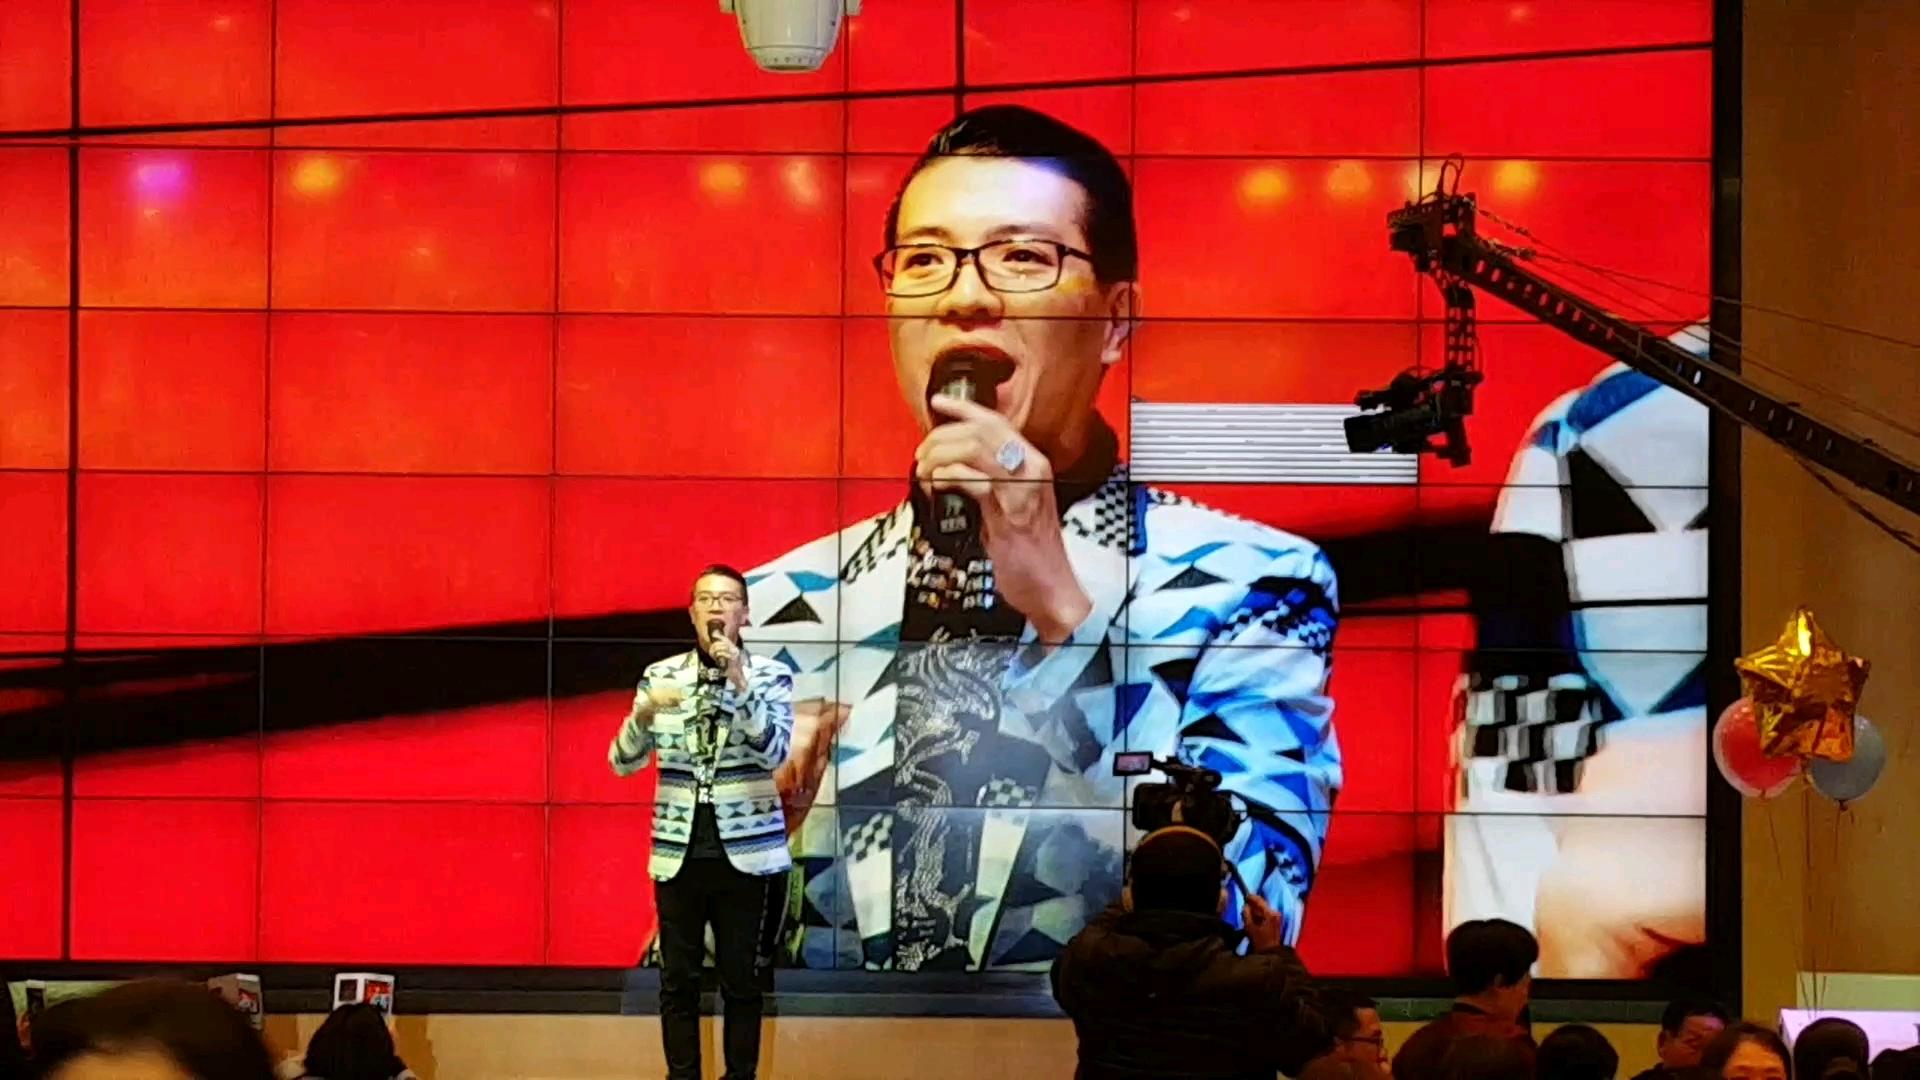 關浩揚 Dolby Kwan《喜氣洋洋》Live in Guangzhou 廣州